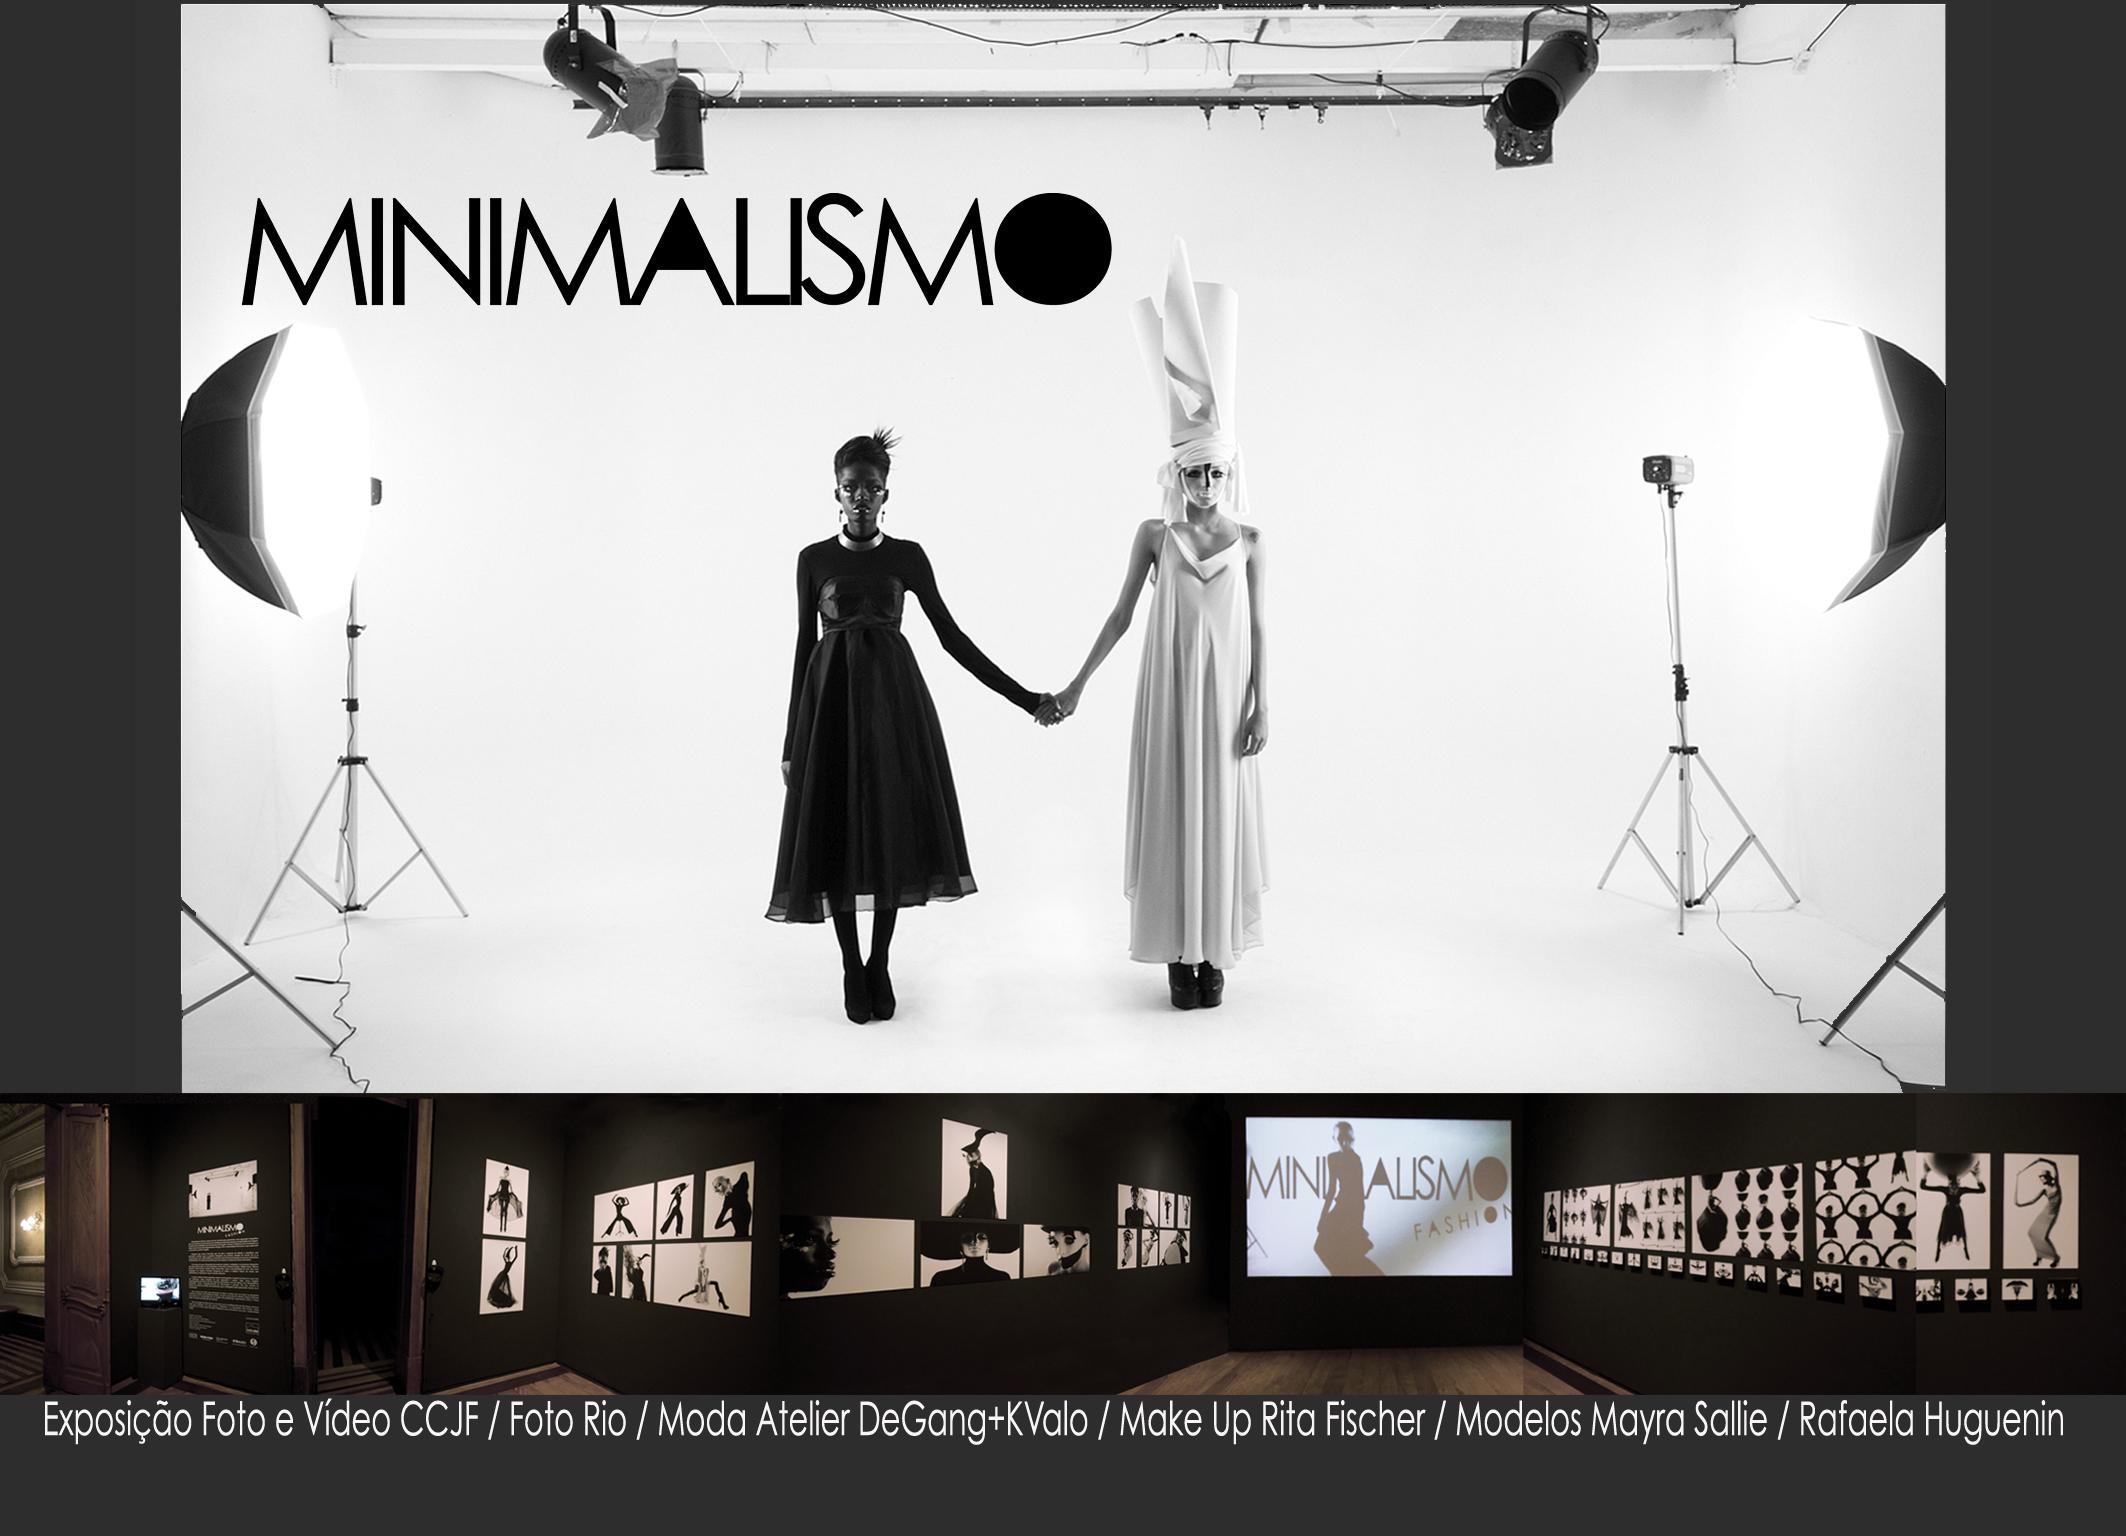 001 Minimalismo